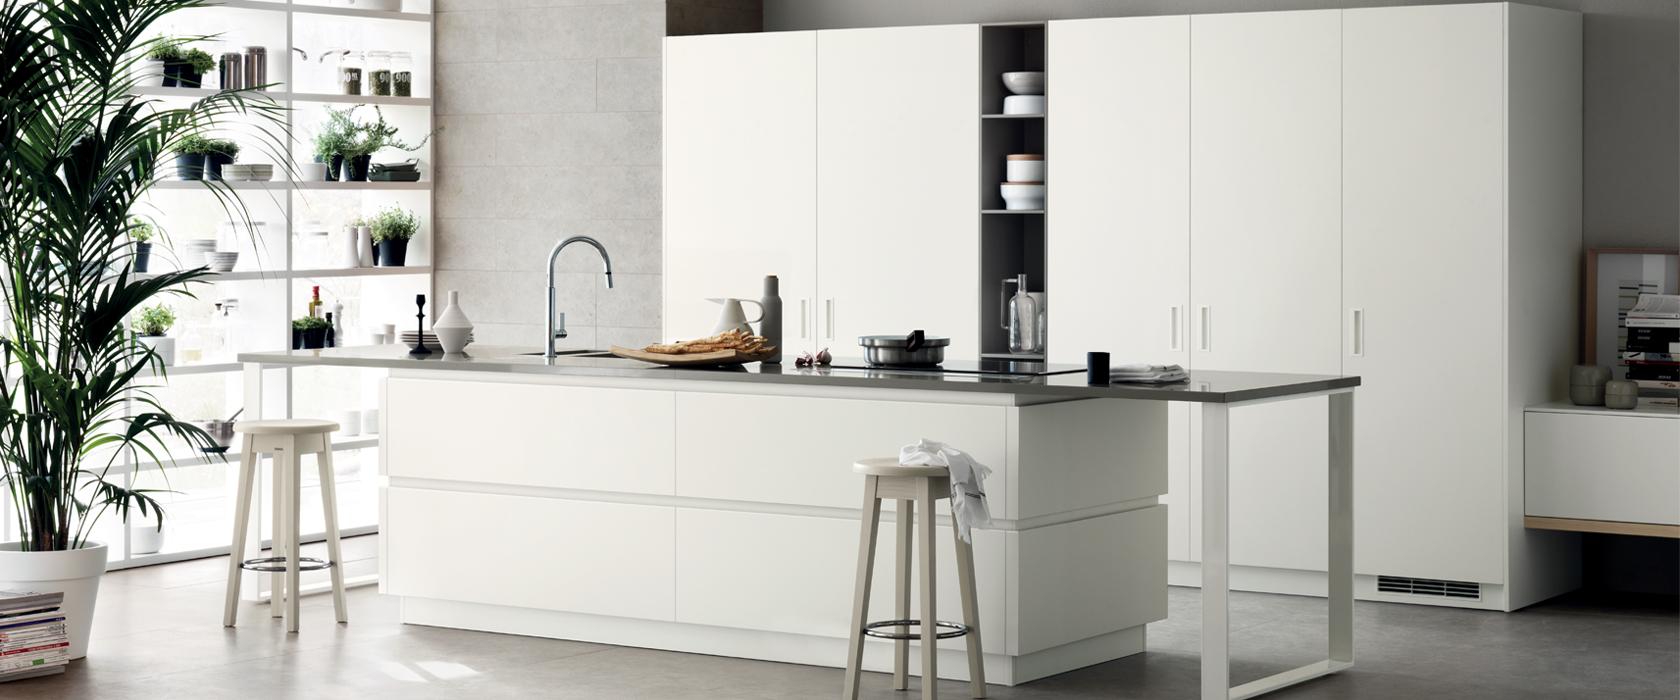 Cucina Moderna Scavolini Foodshelf-mobili incardone